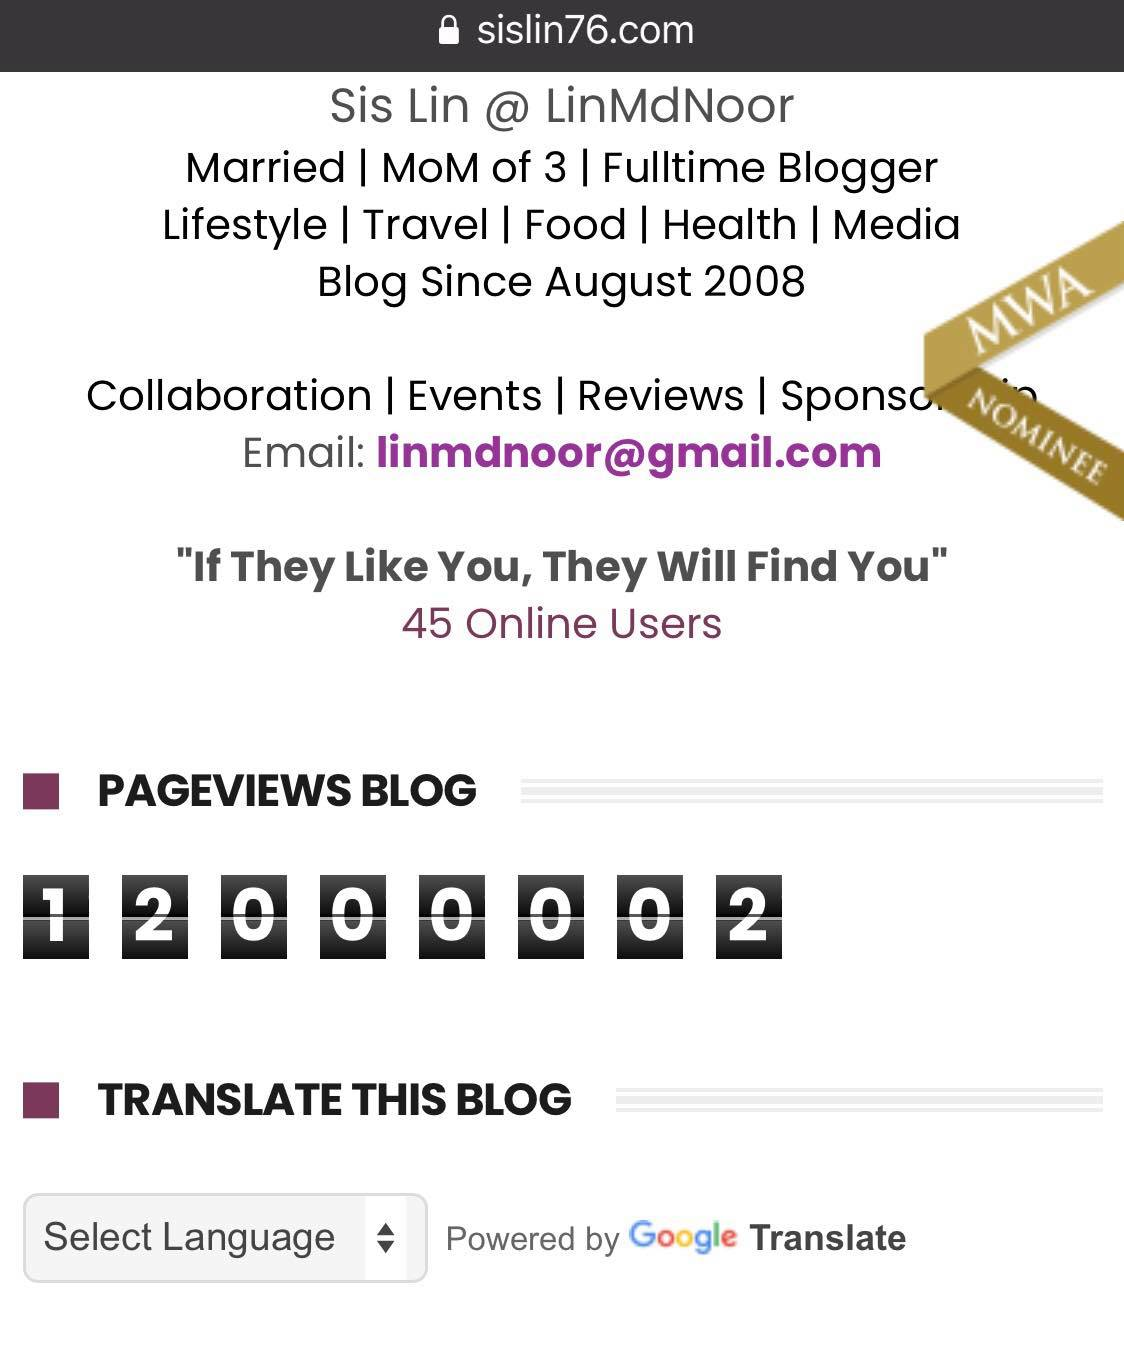 Pageviews Blog Aku Sudah Mencecah 12 000 000 JUTA!